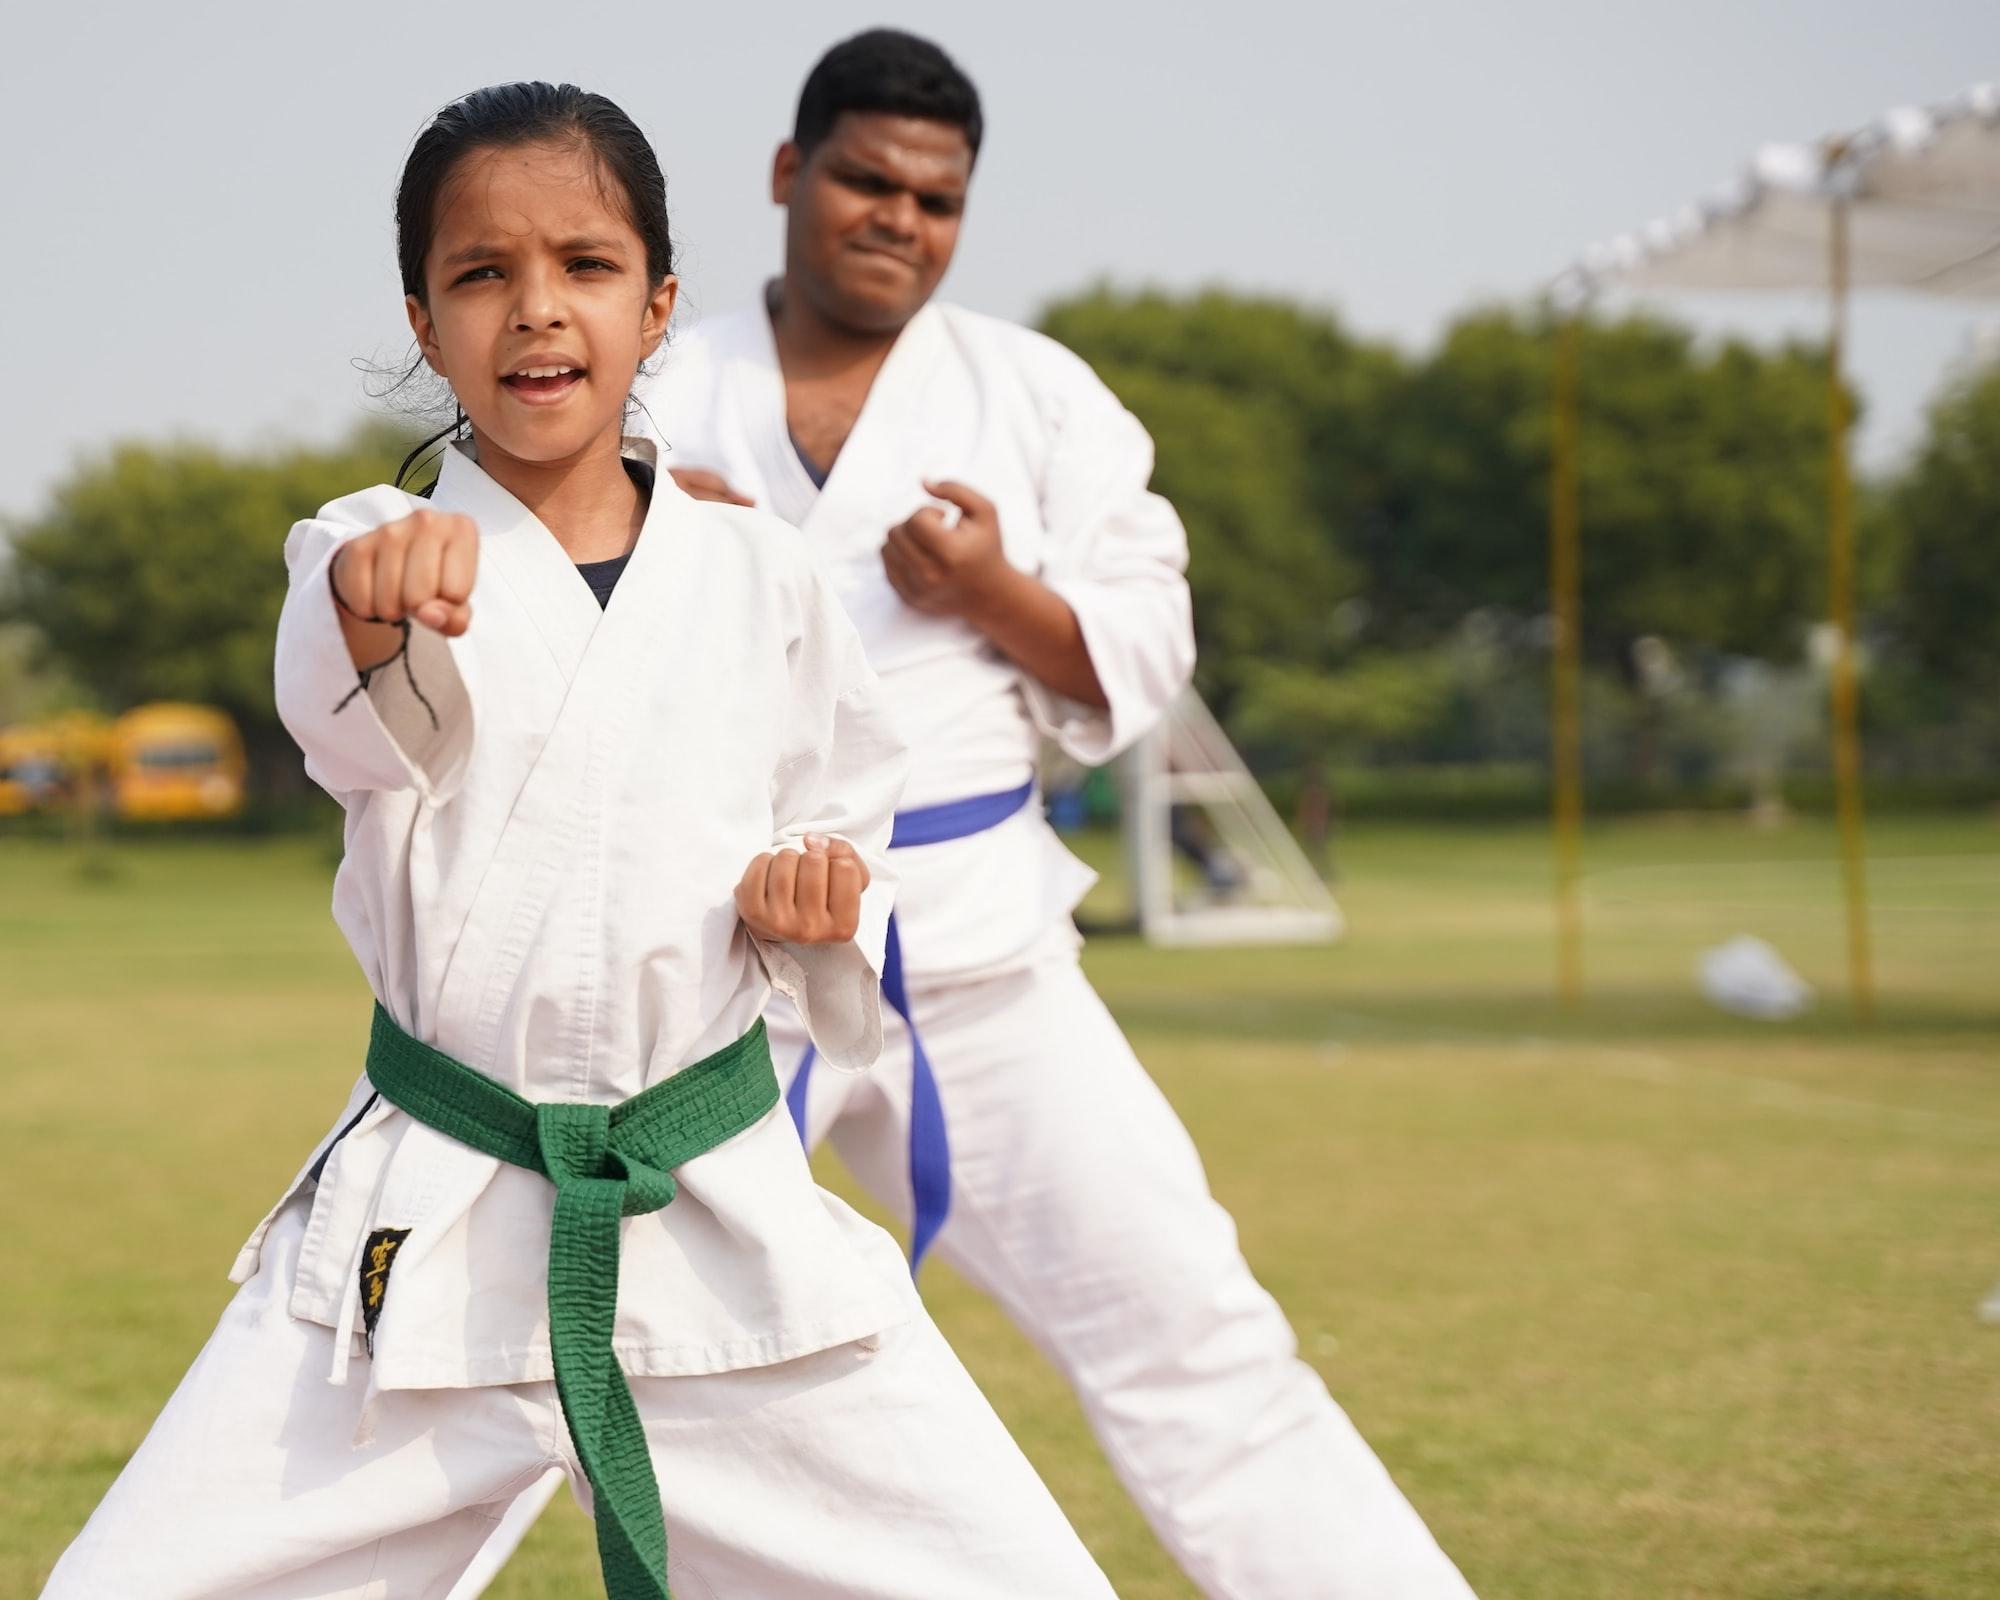 Top 12 Best Karate Classes & Schools In London